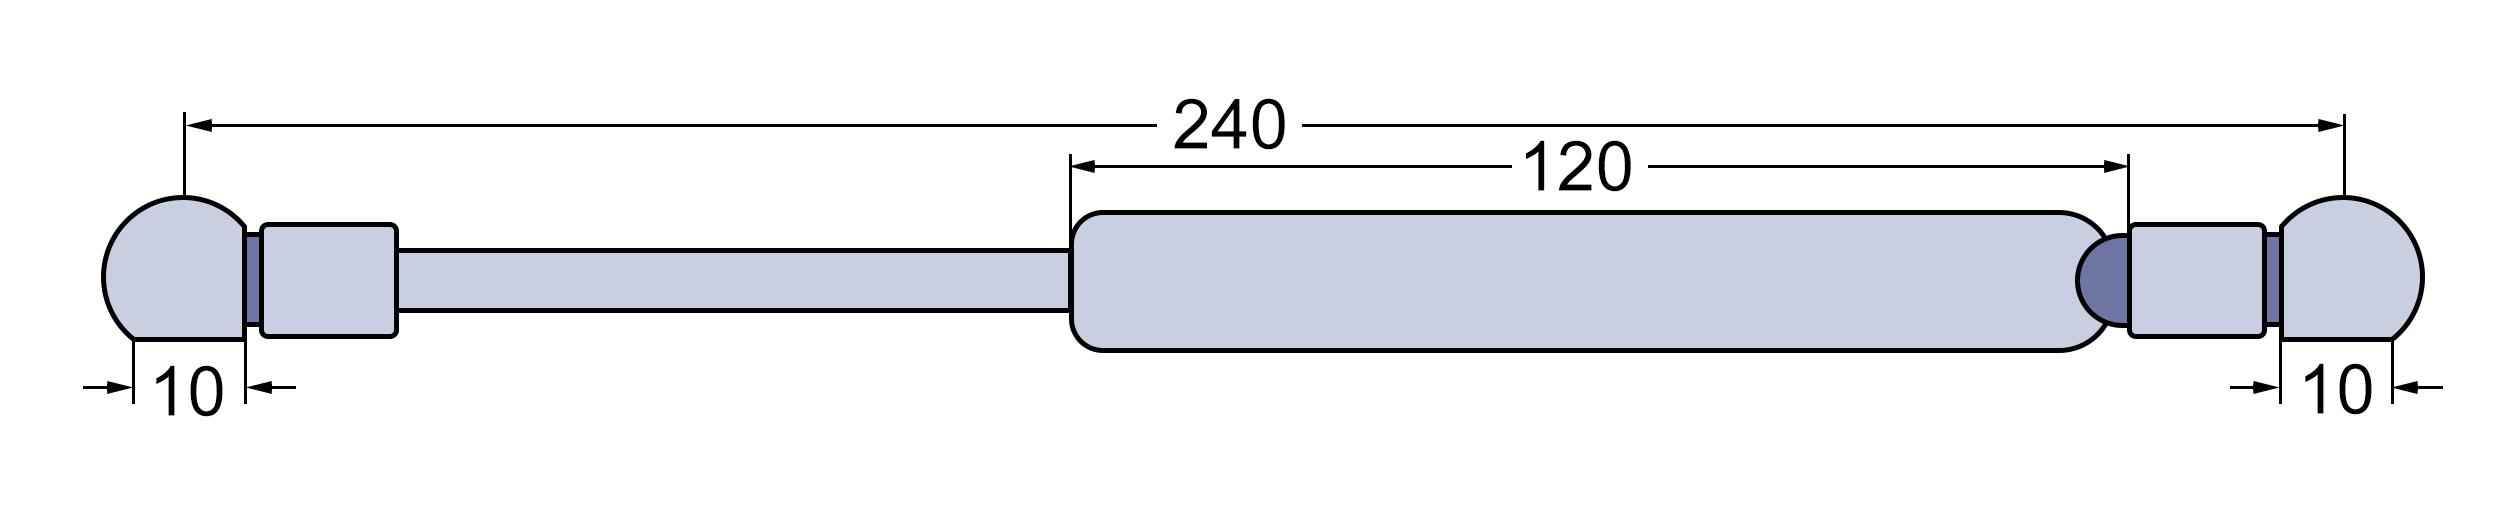 80-260 106-160MK3 6.00-6.45 Gasdruckfeder Deutz Tür Agrotron 4.70-4.95